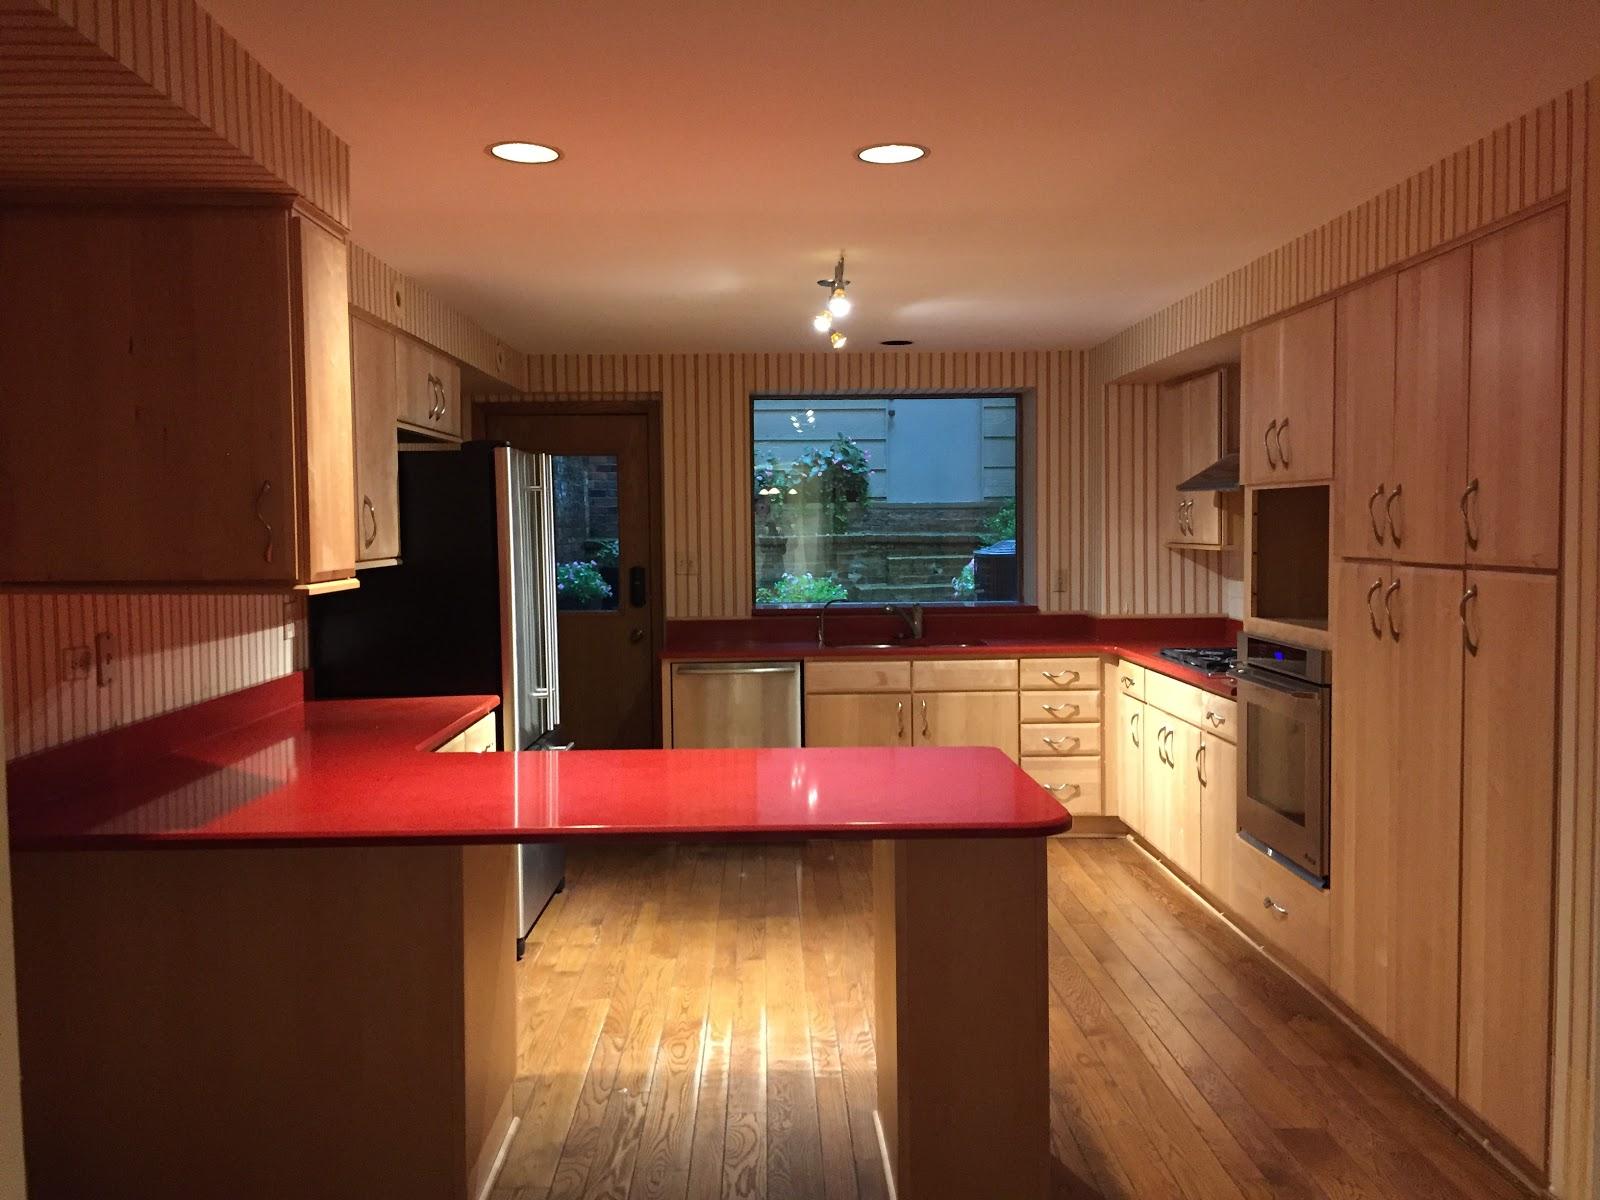 Kitchen Wallpaper Stripes Best D Grass Stripes Kitchen Mat Floor